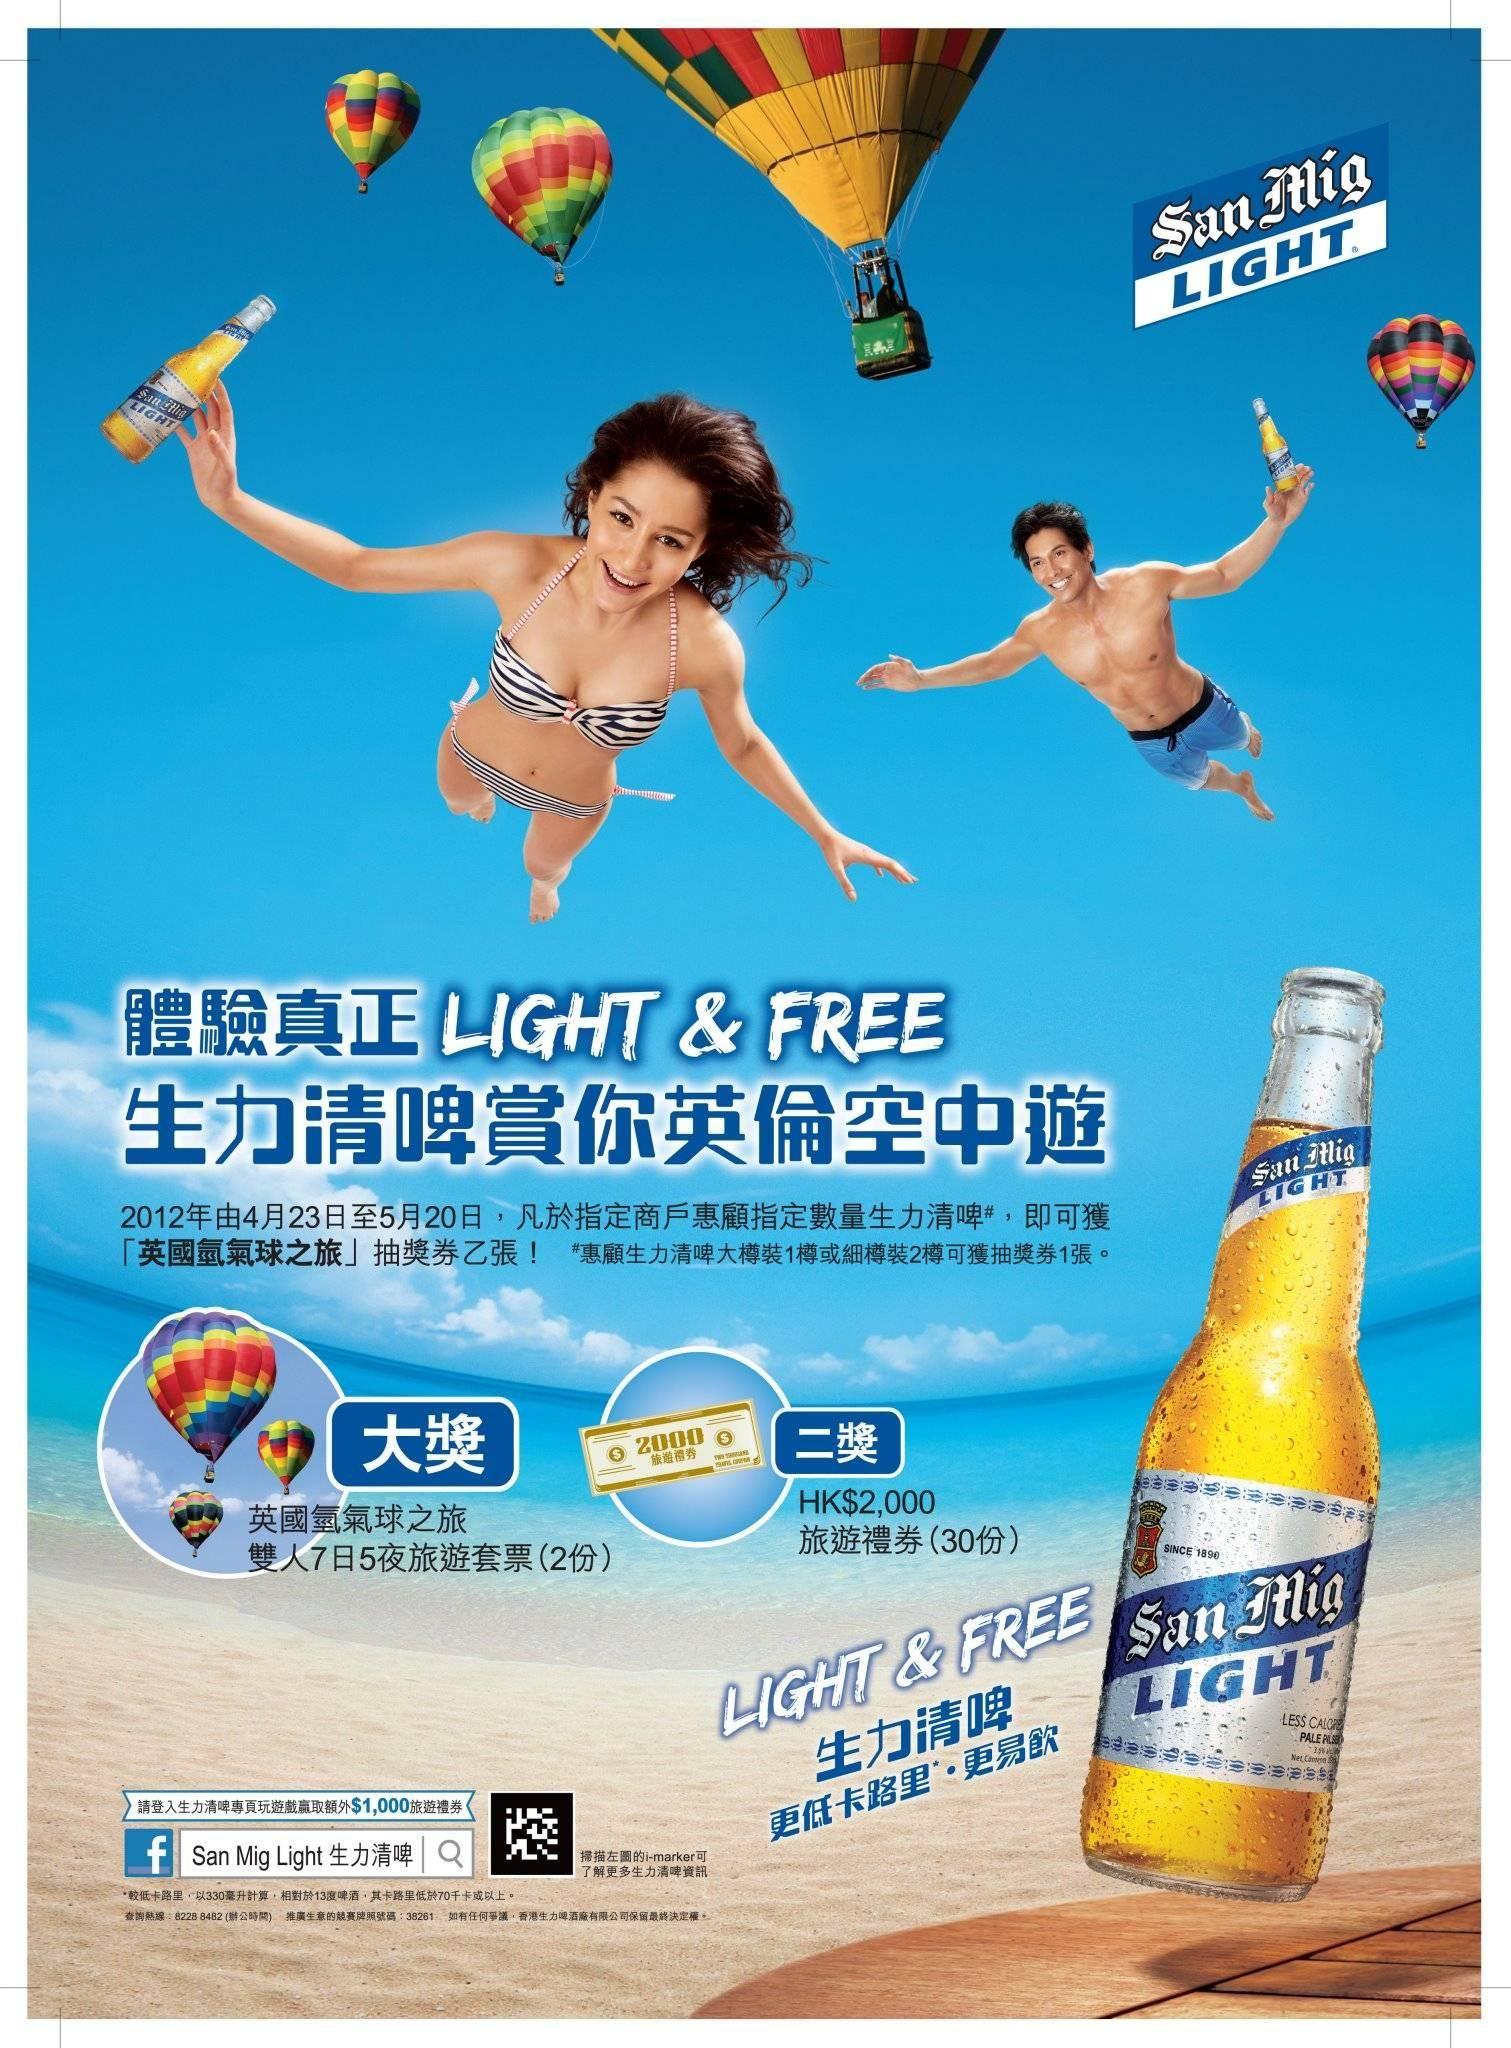 J San Mig Light J Poster Ads Corona Beer Bottle Drinking Water